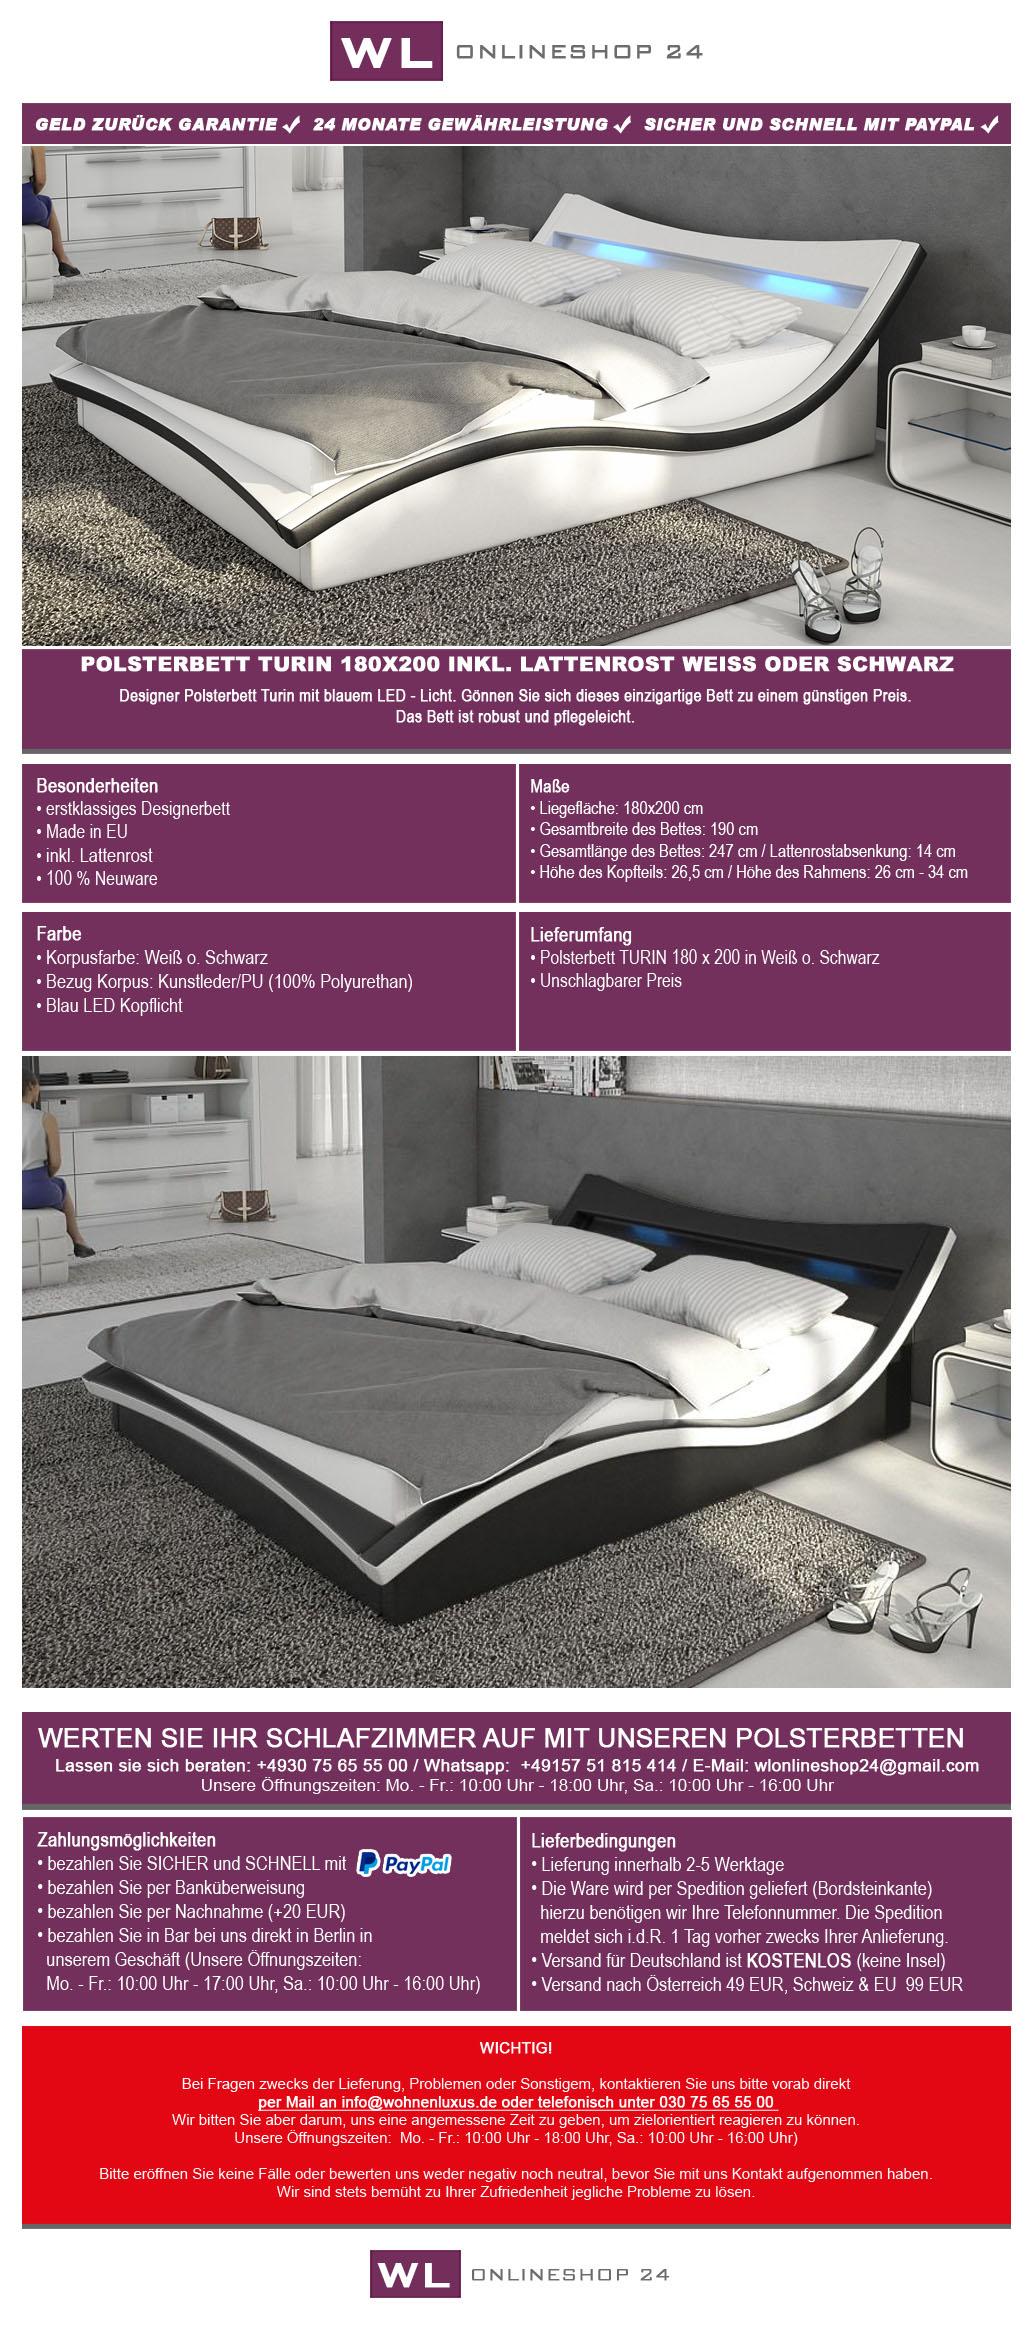 polsterbett 180x200 turin wei schwarz lattenrost ehebett. Black Bedroom Furniture Sets. Home Design Ideas